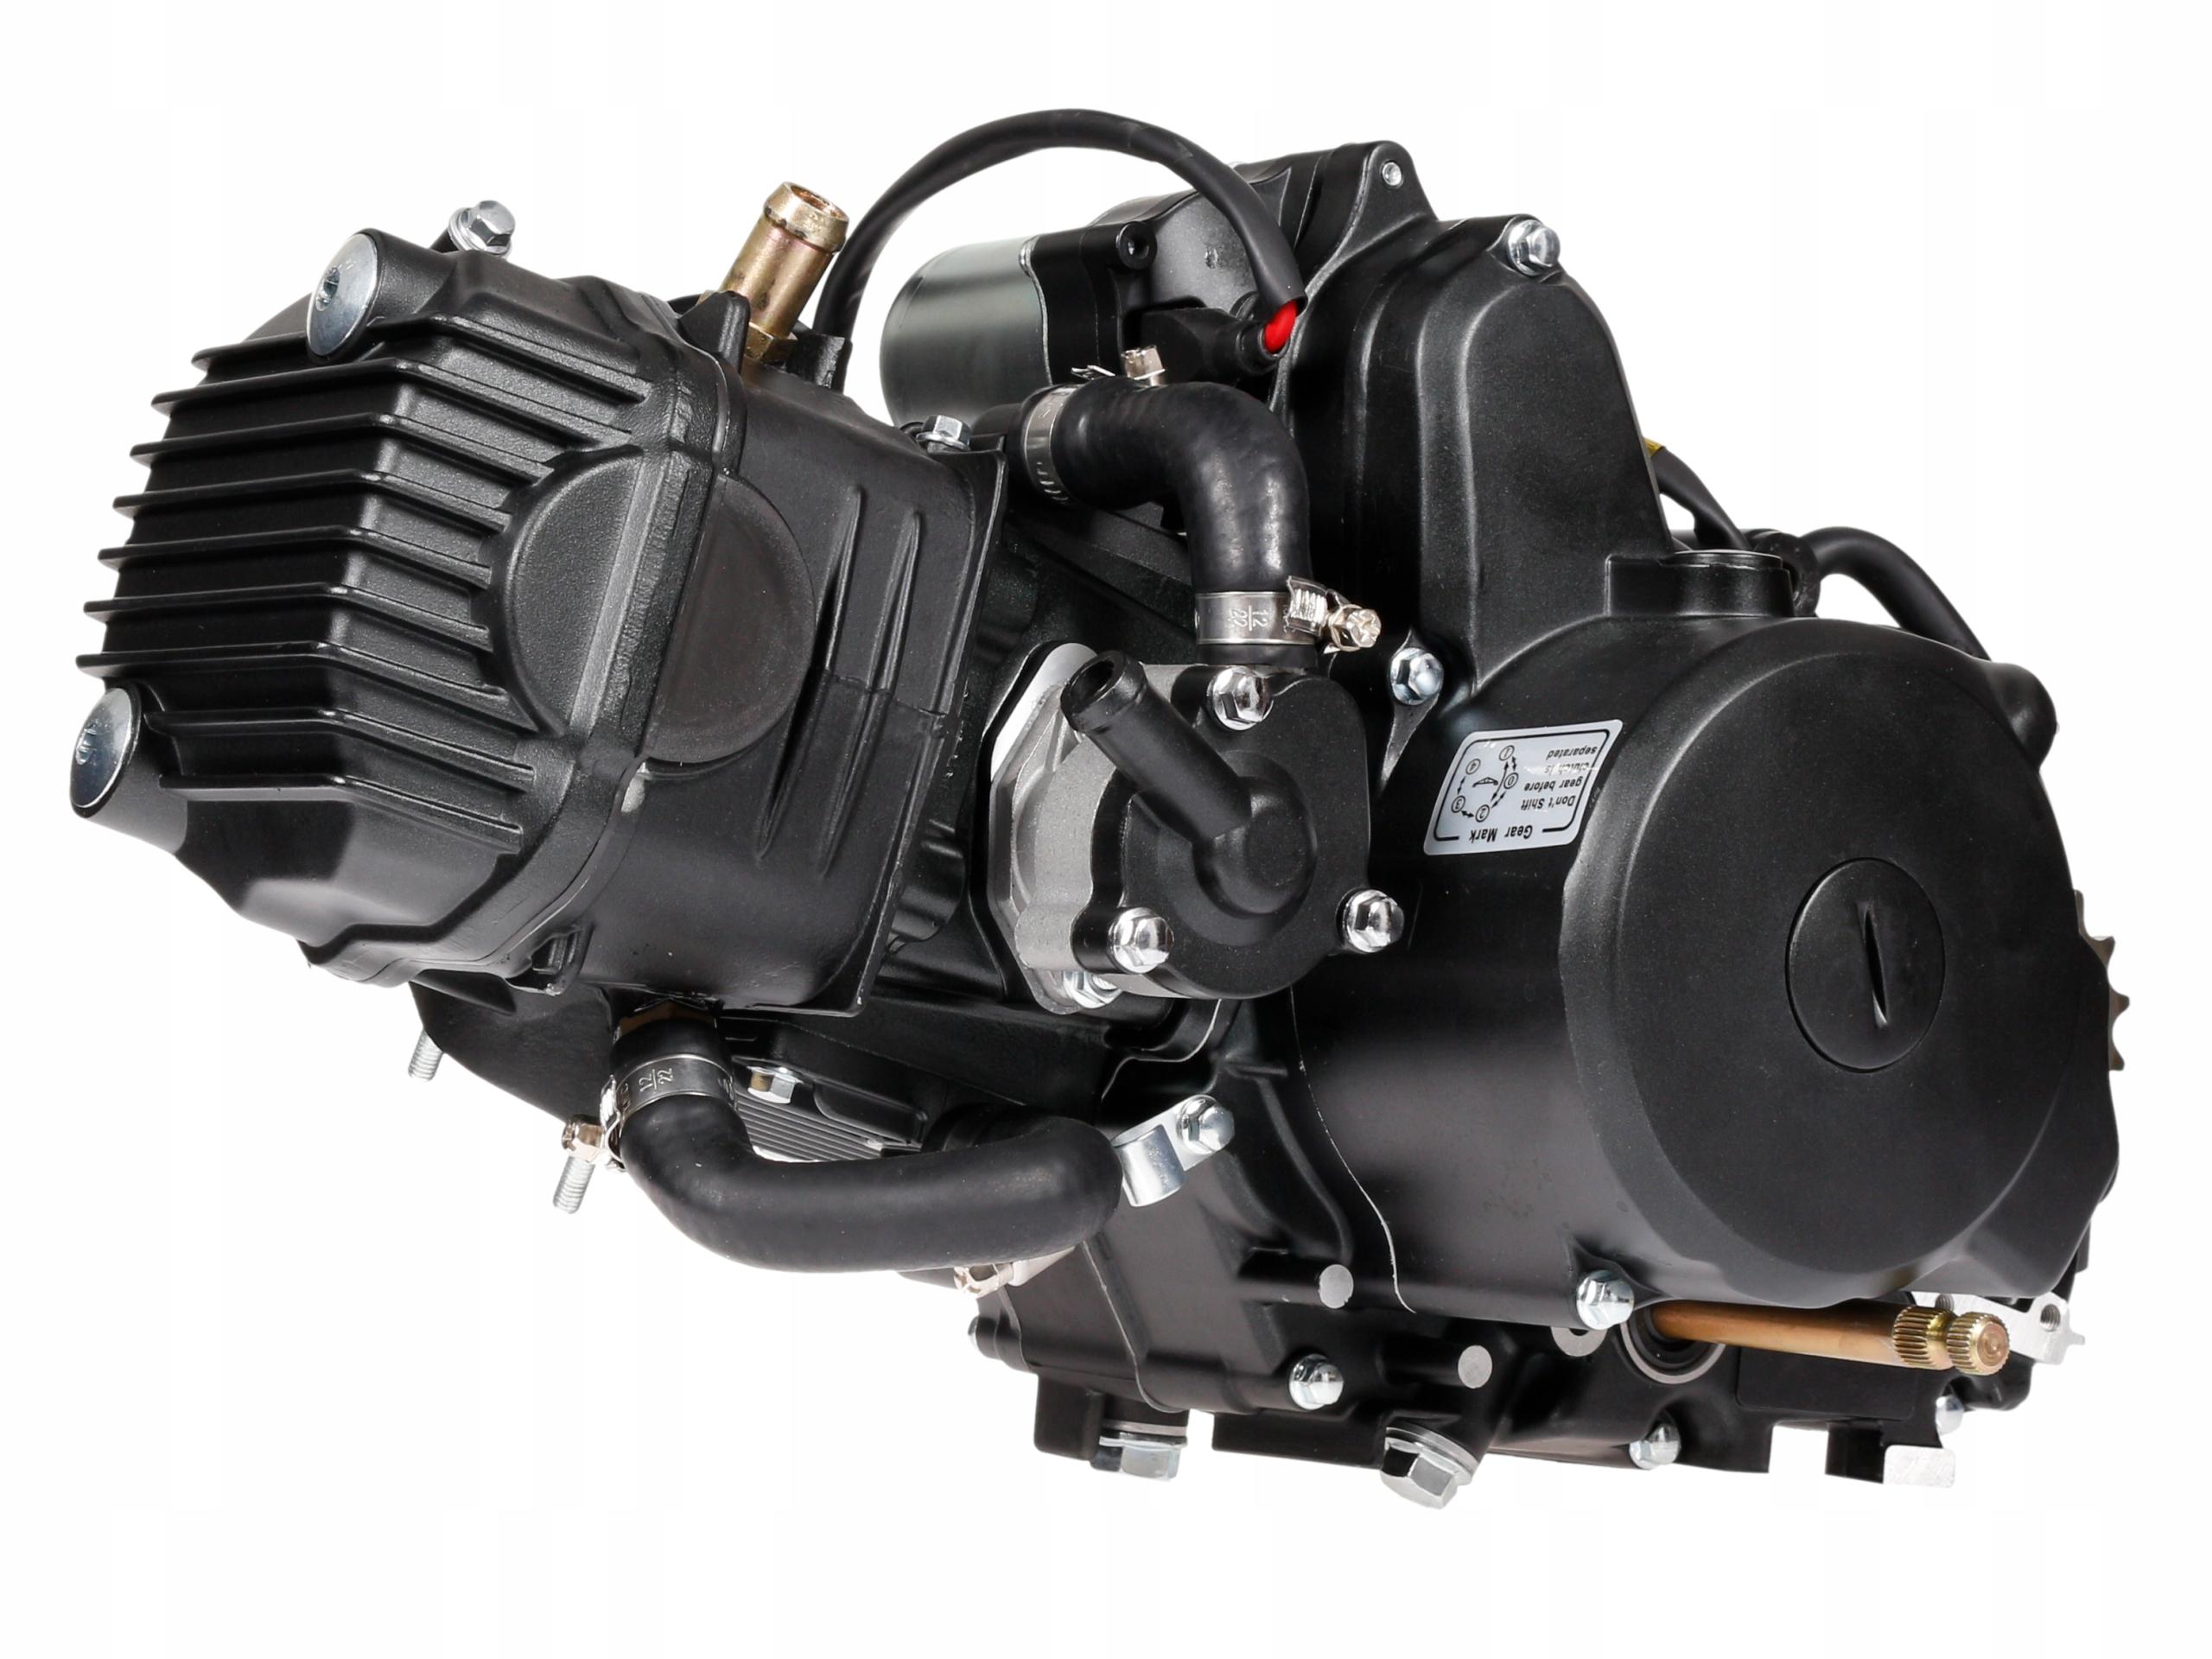 Двигатель 130см Moretti 4T LIQUID Джунак Ромет Бартон